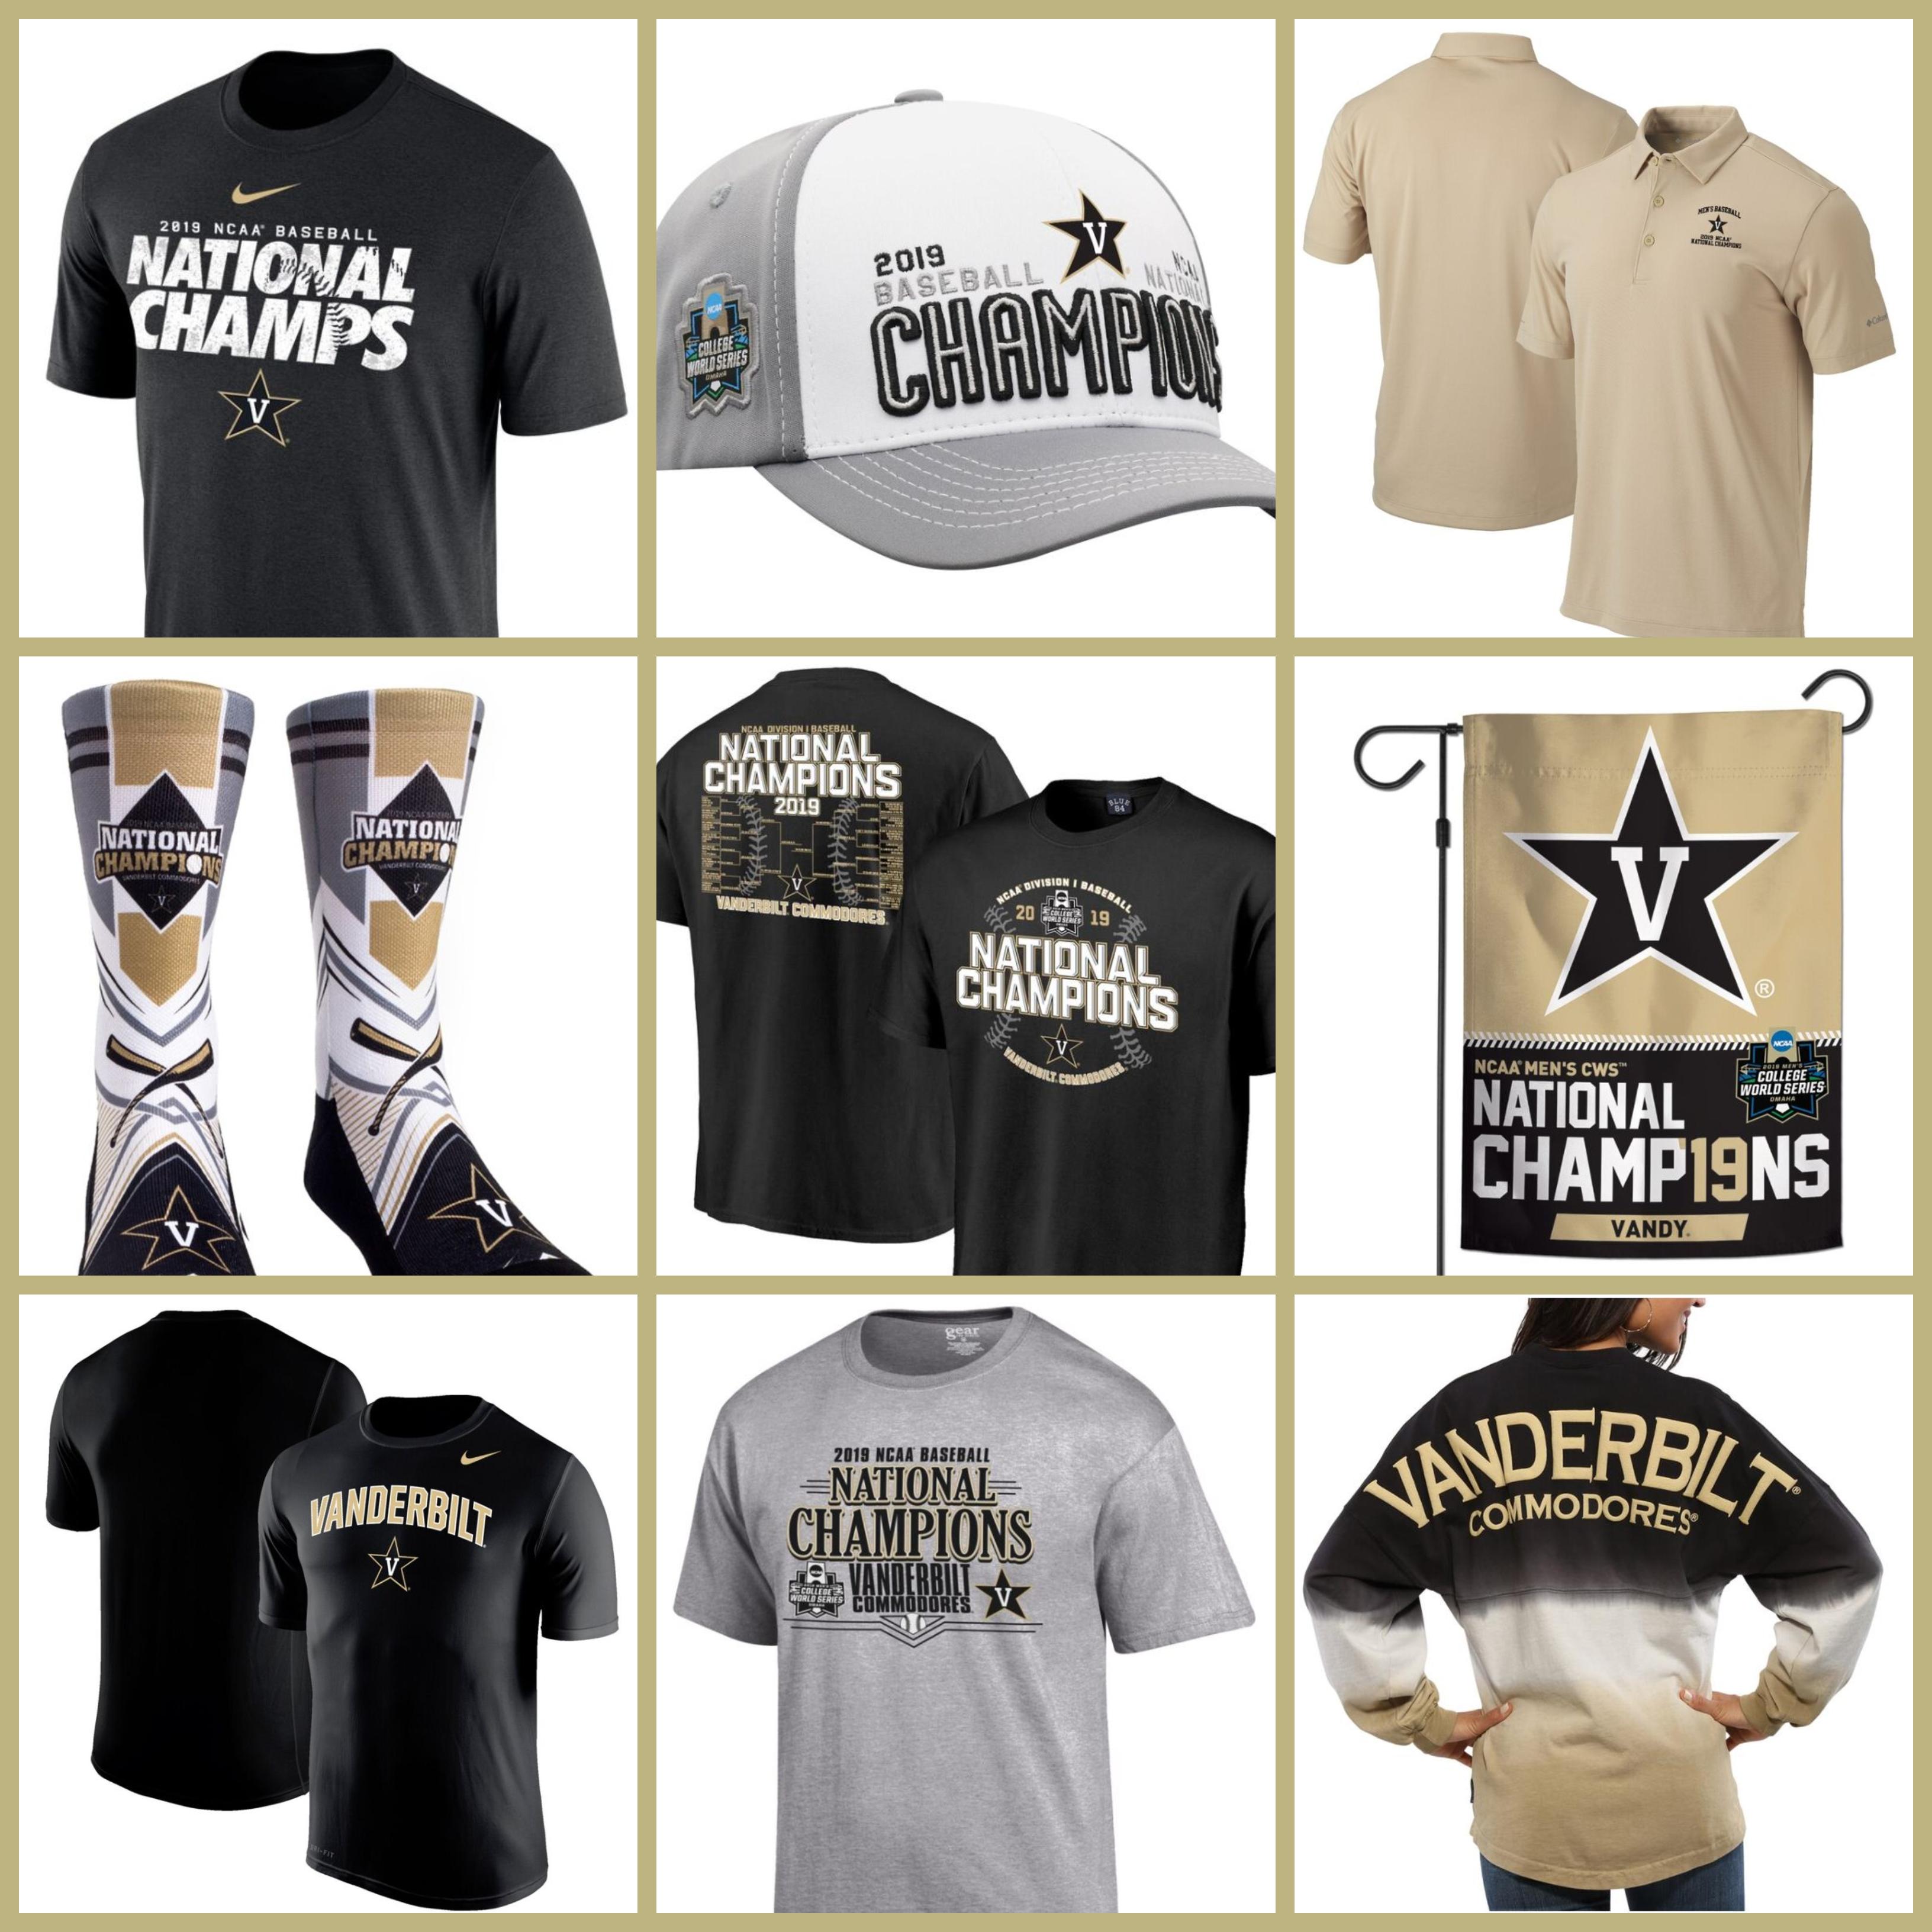 on sale 1219c aad4b The 15 Best Vanderbilt Baseball Championship T-shirts, CWS Jerseys and Baseball  Caps